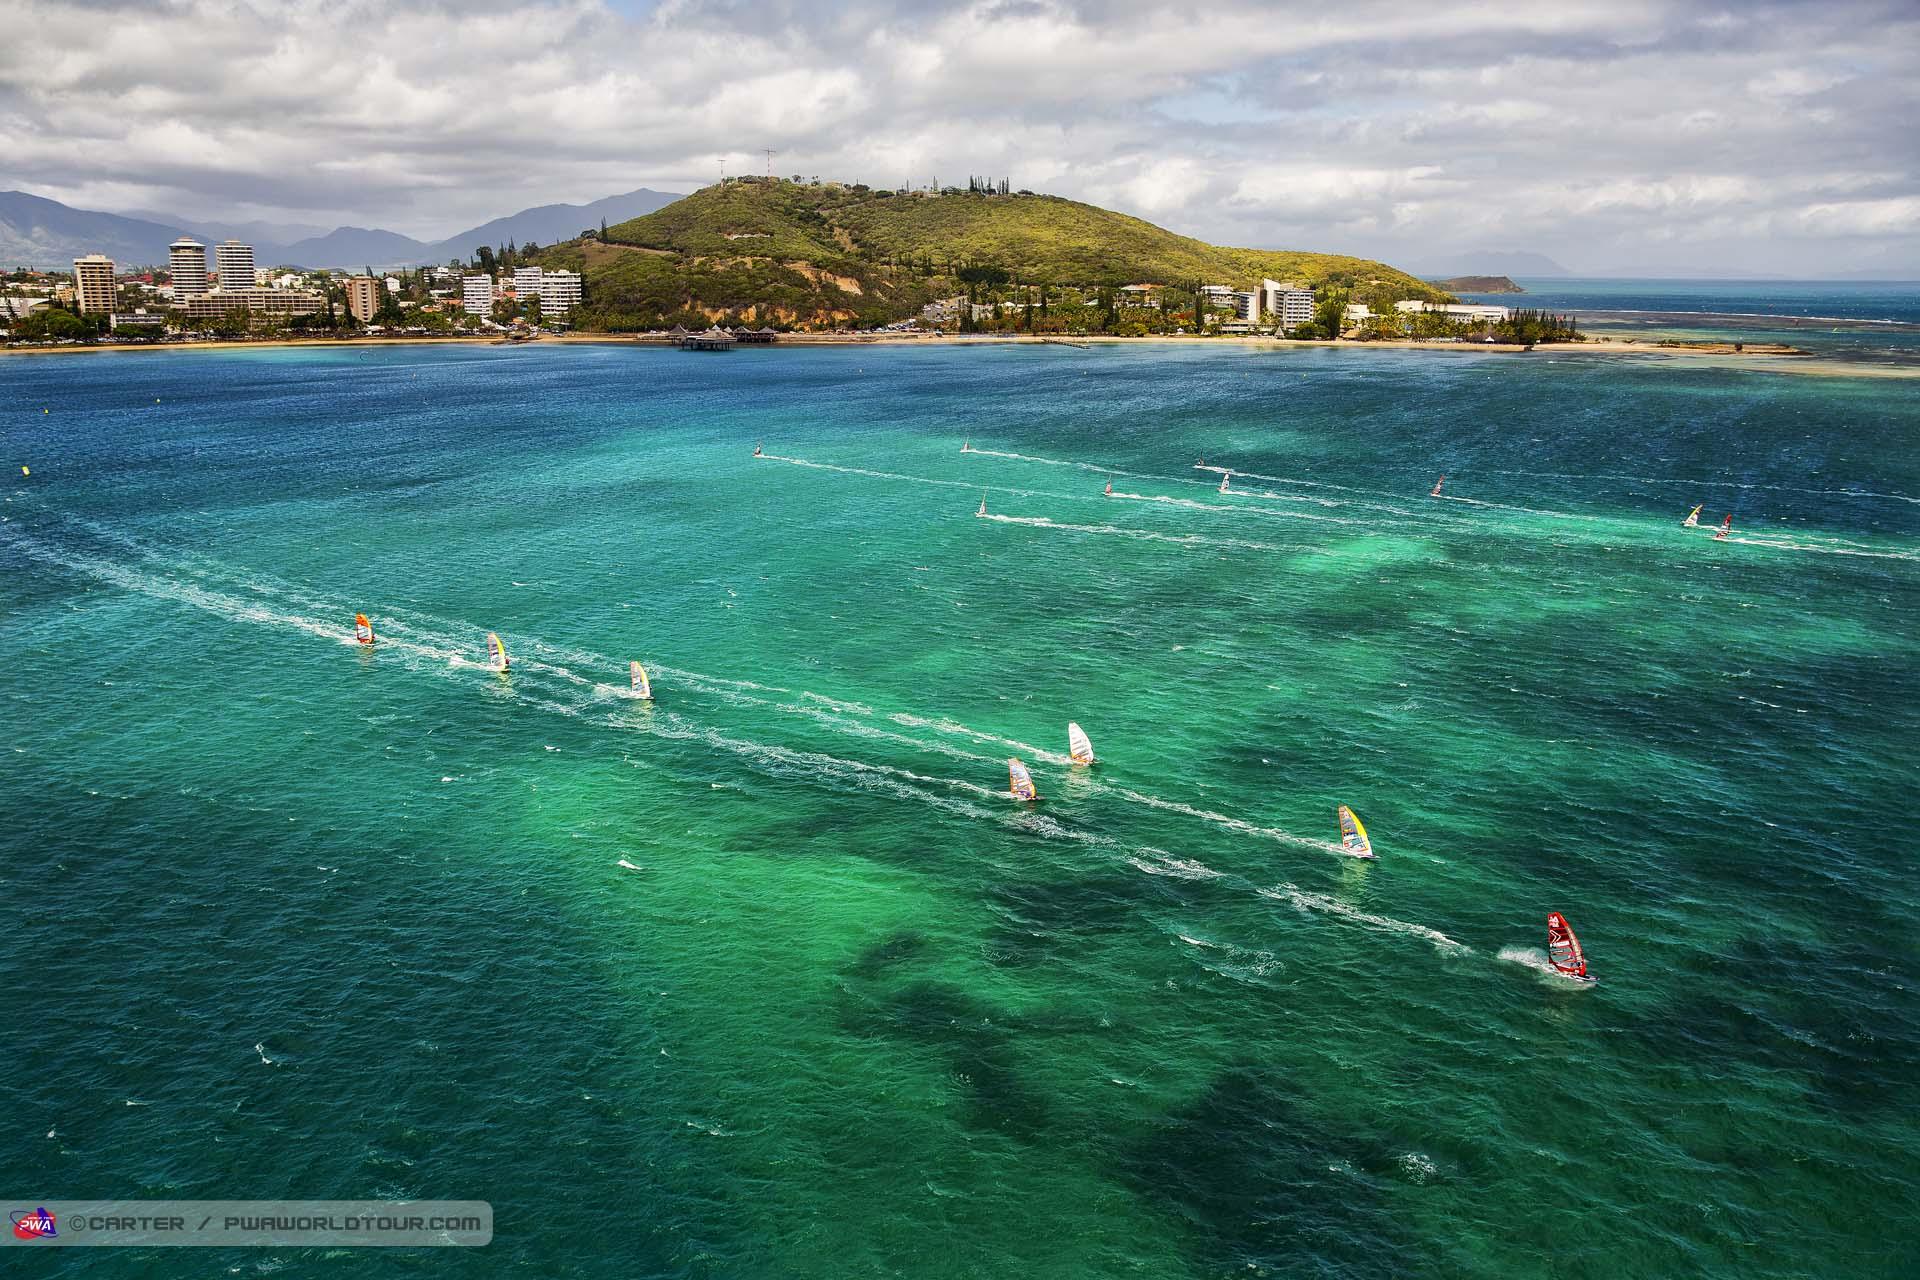 Pwa world windsurfing tour airwaves noumea pwa dream cup for The caledonia